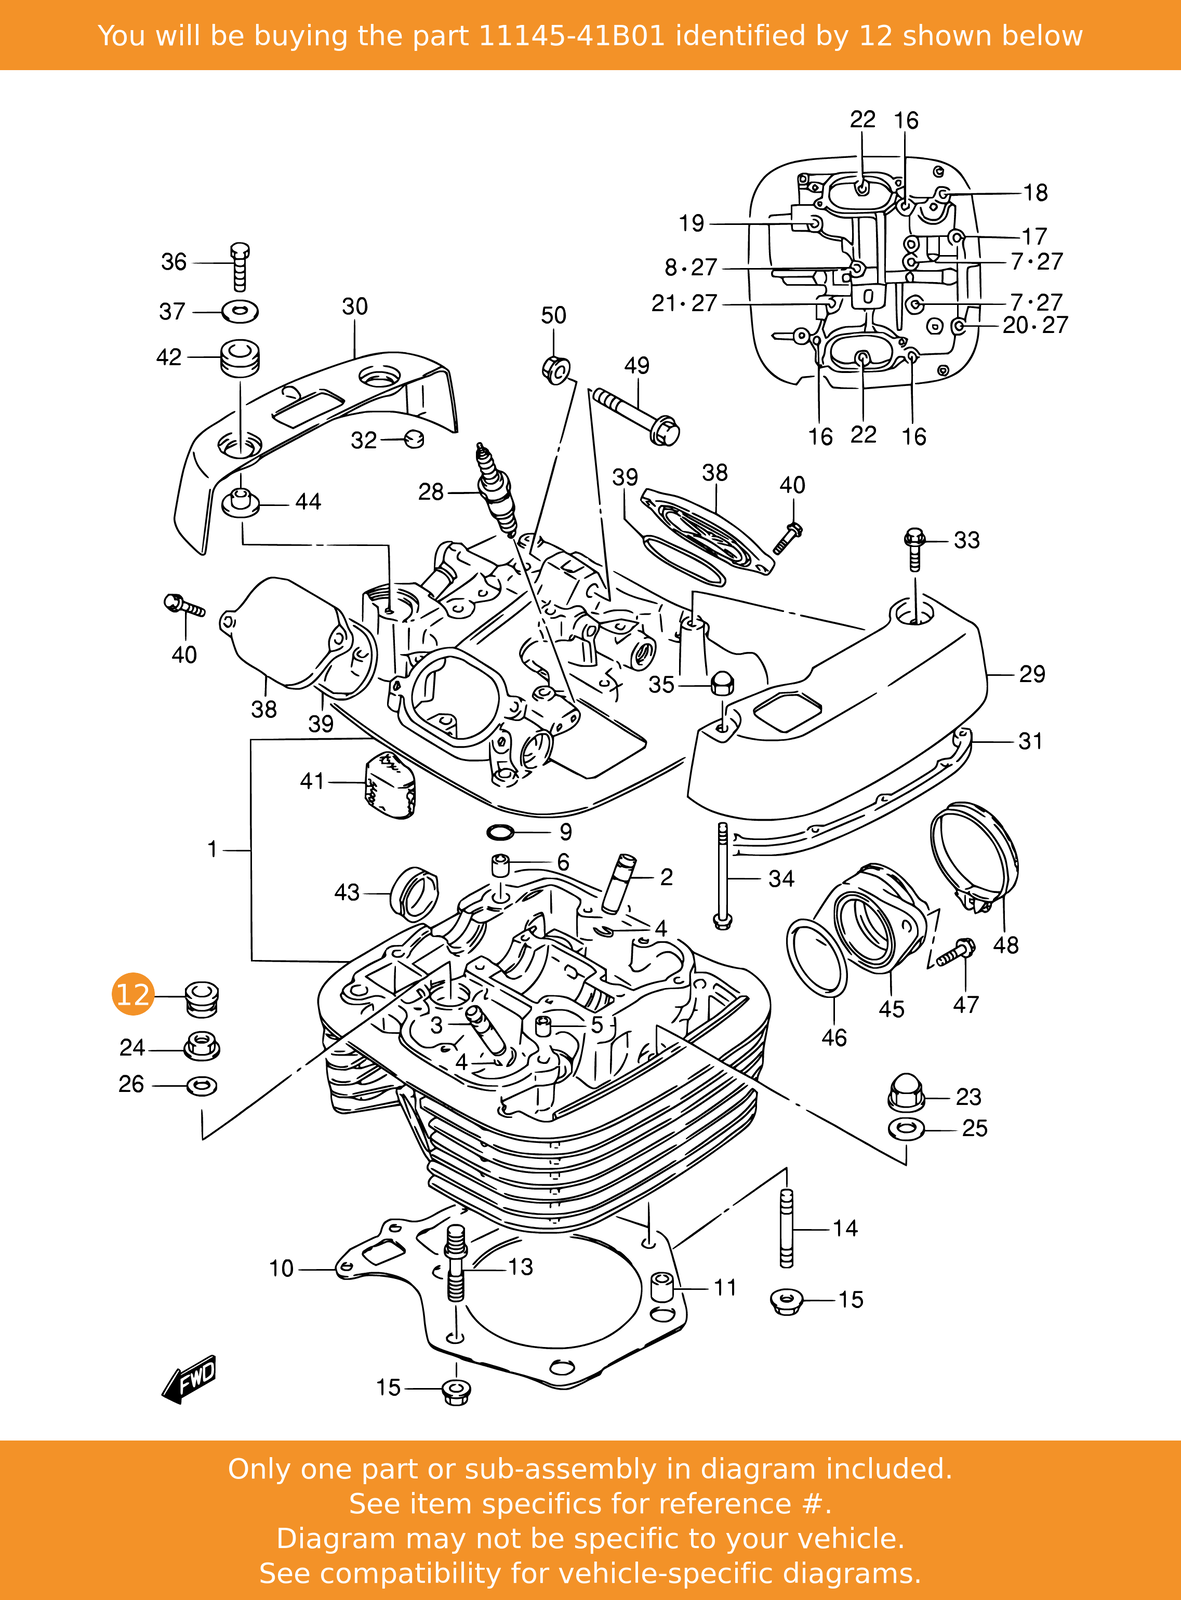 Suzuki Cap Cylinder He 11145-41B01 New Oem